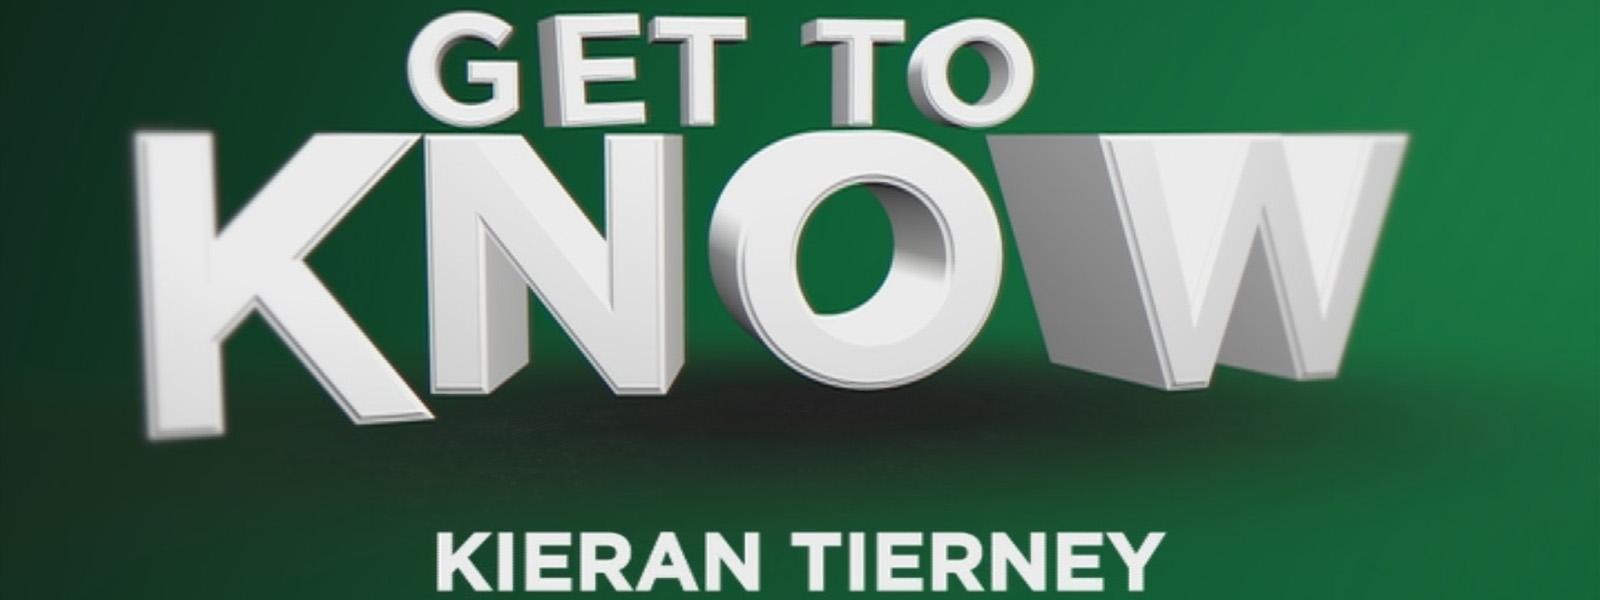 Get to Know Kieran Tierney